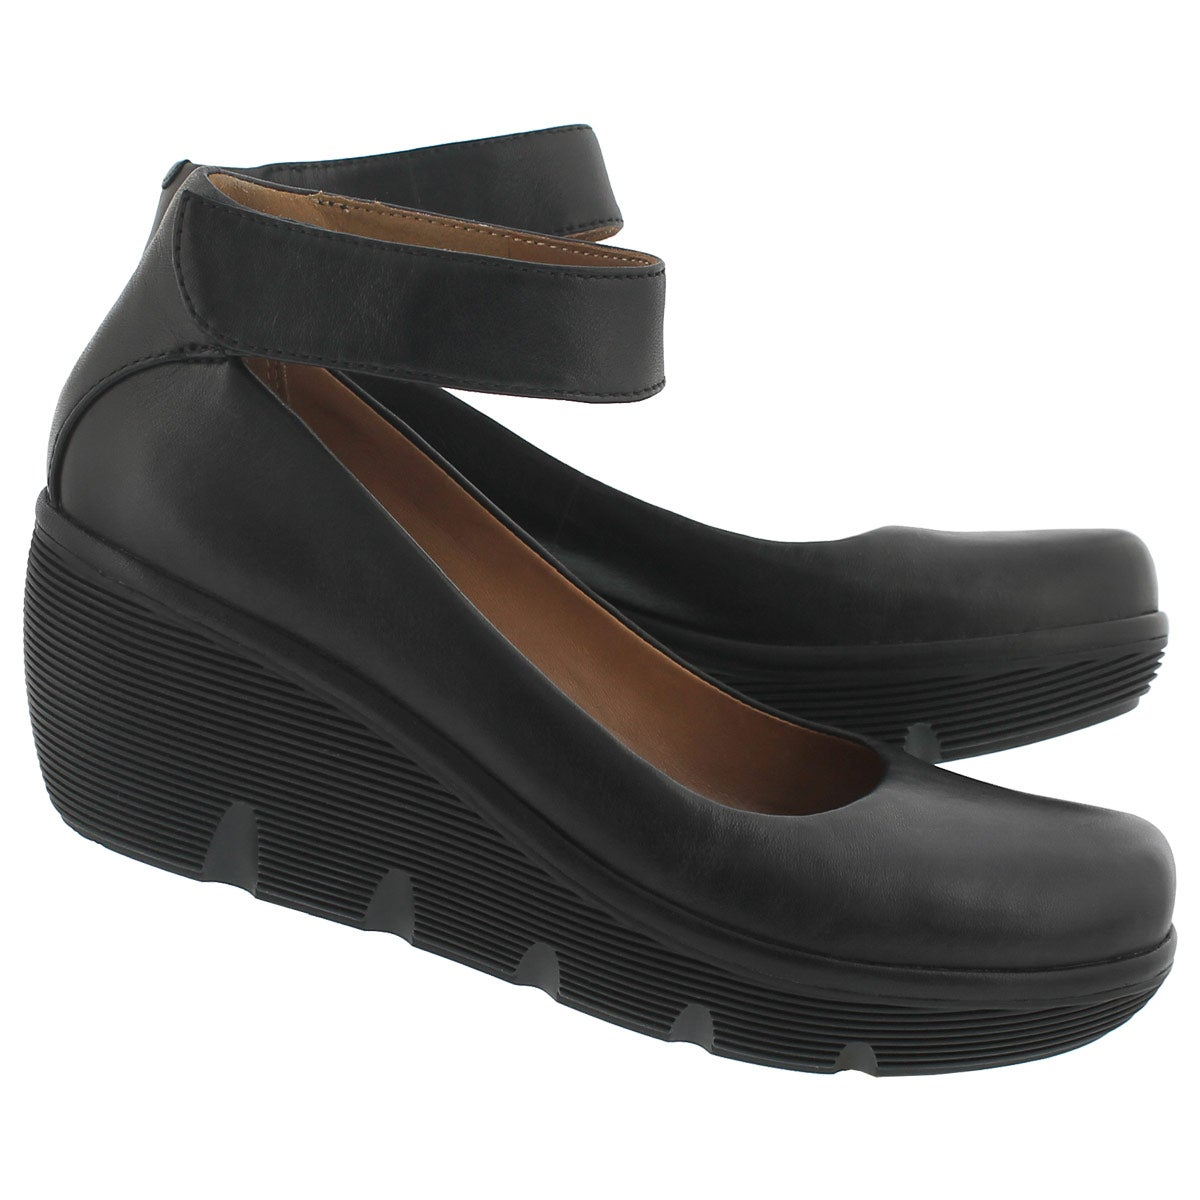 Lds Clarene Tide blk ankle strap wedge